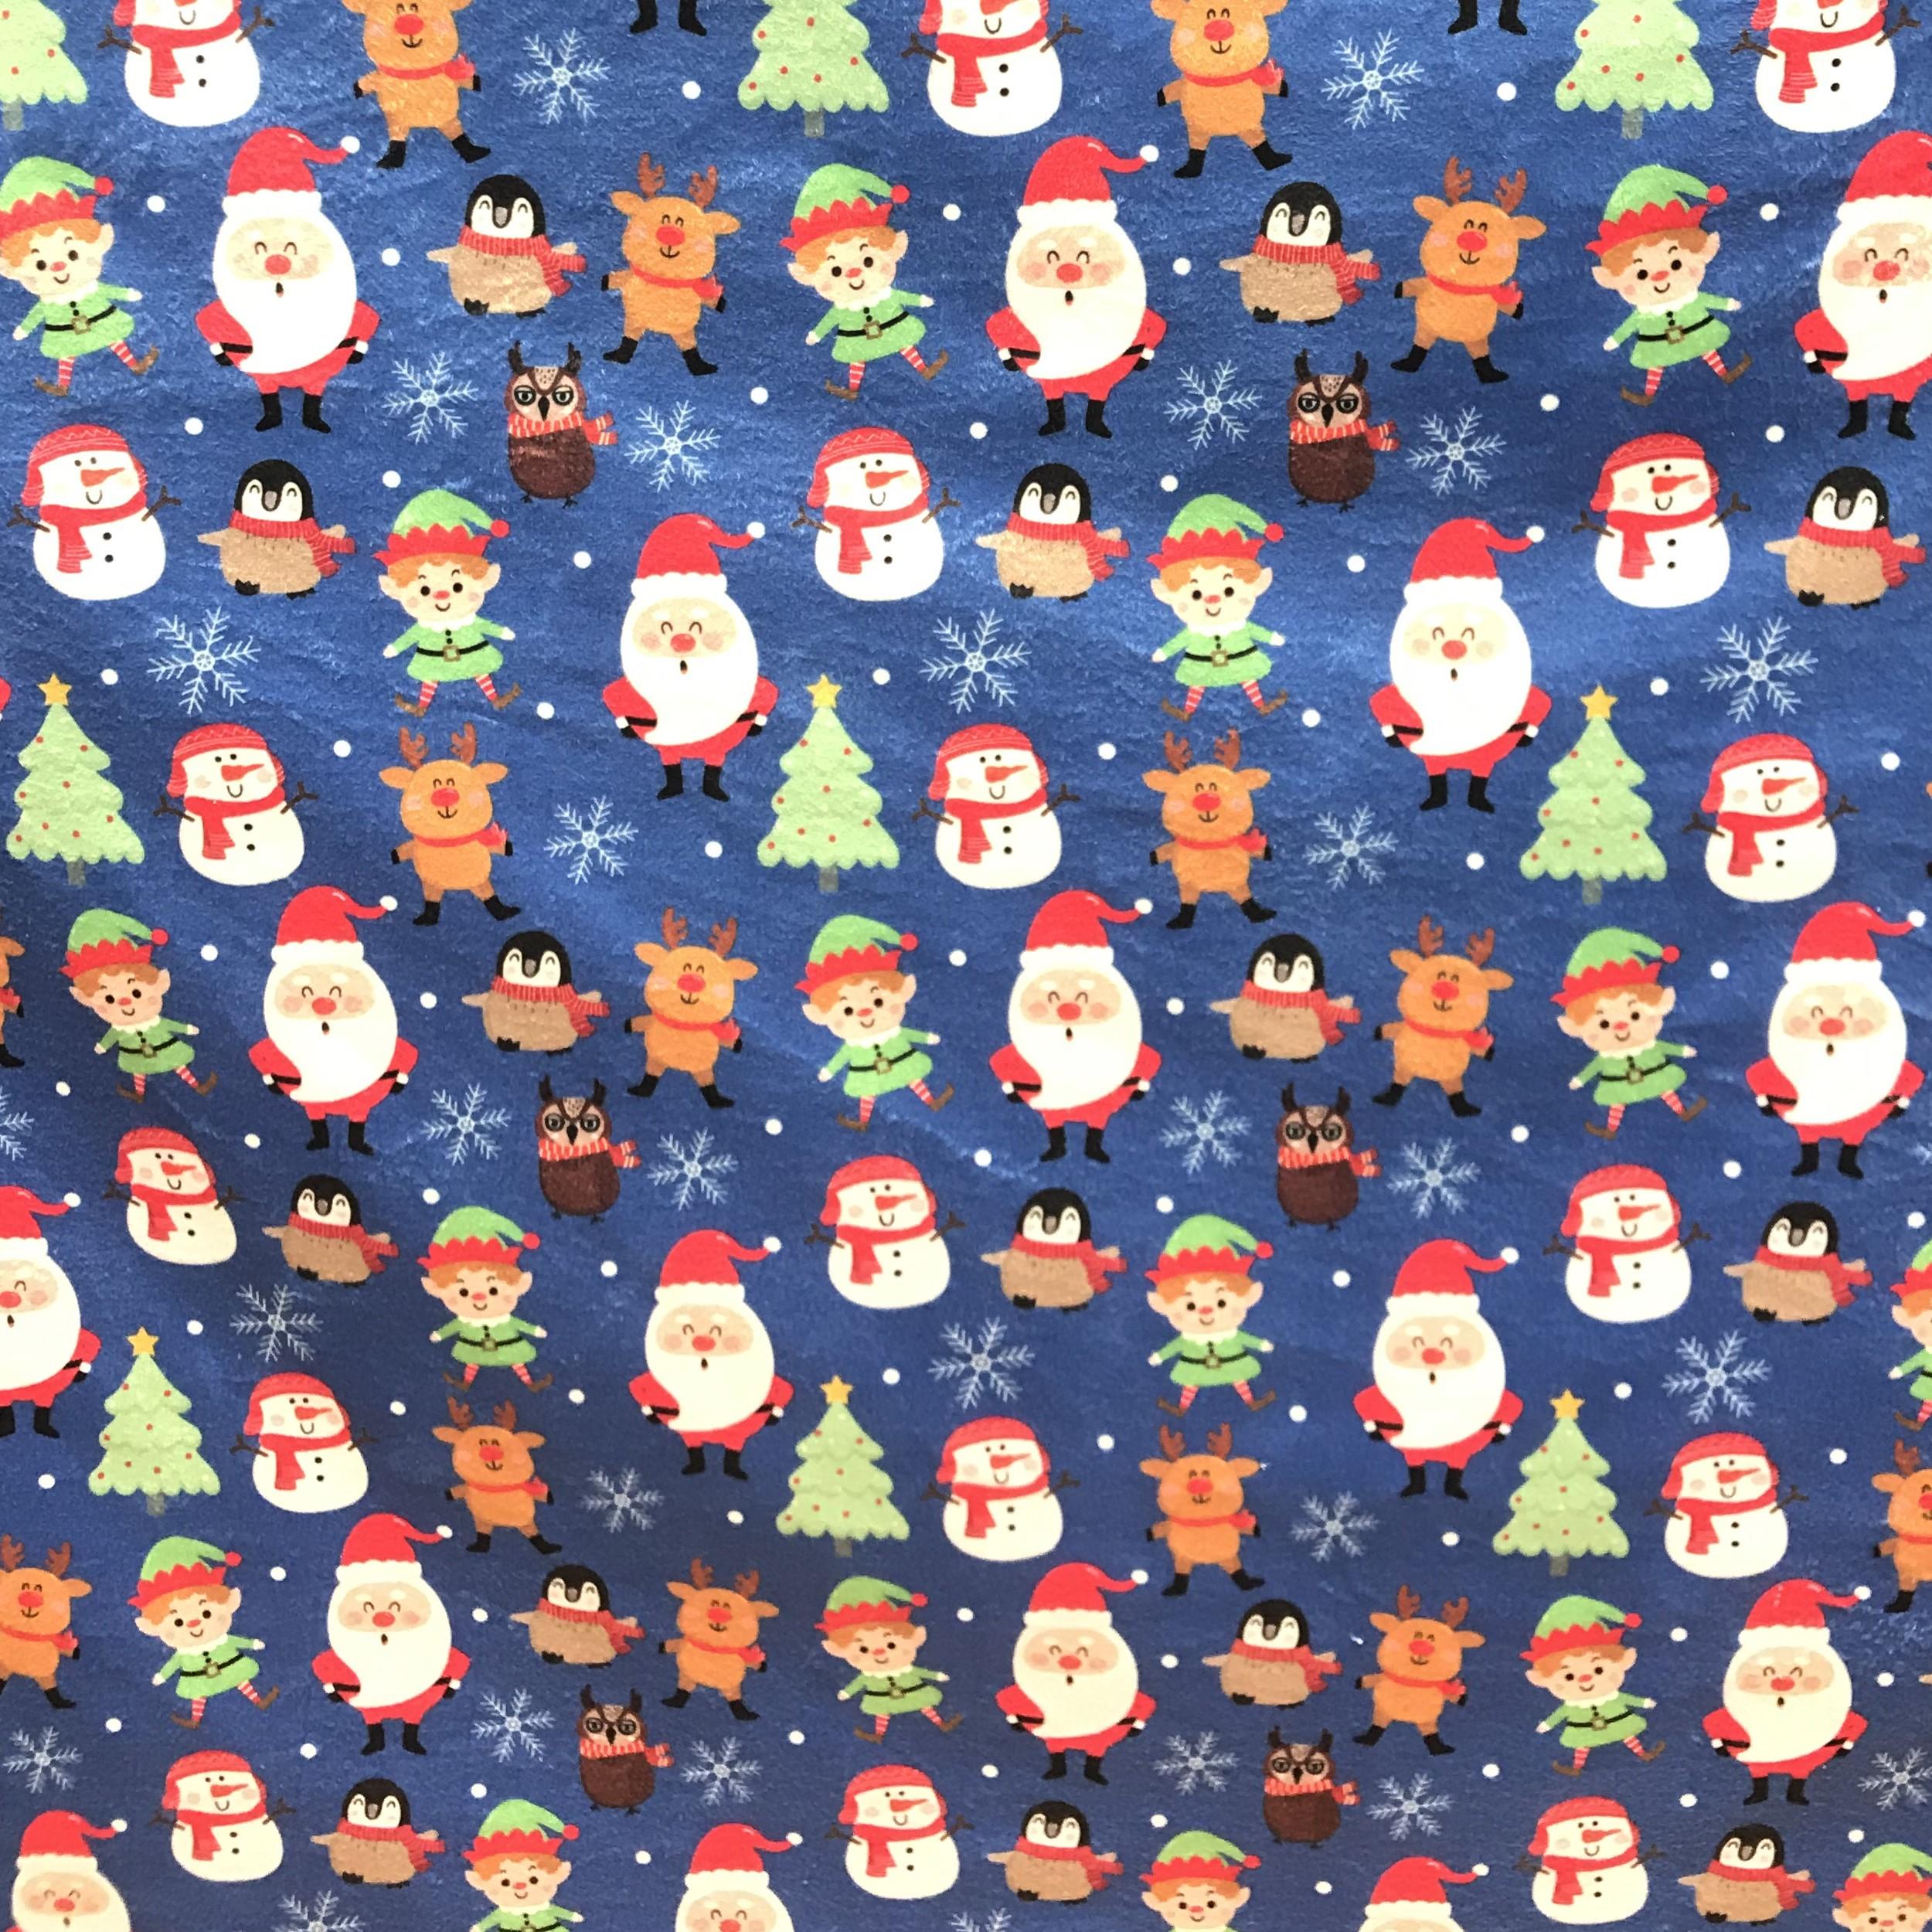 پارچه لباس مدل کریسمس کد 2-1131